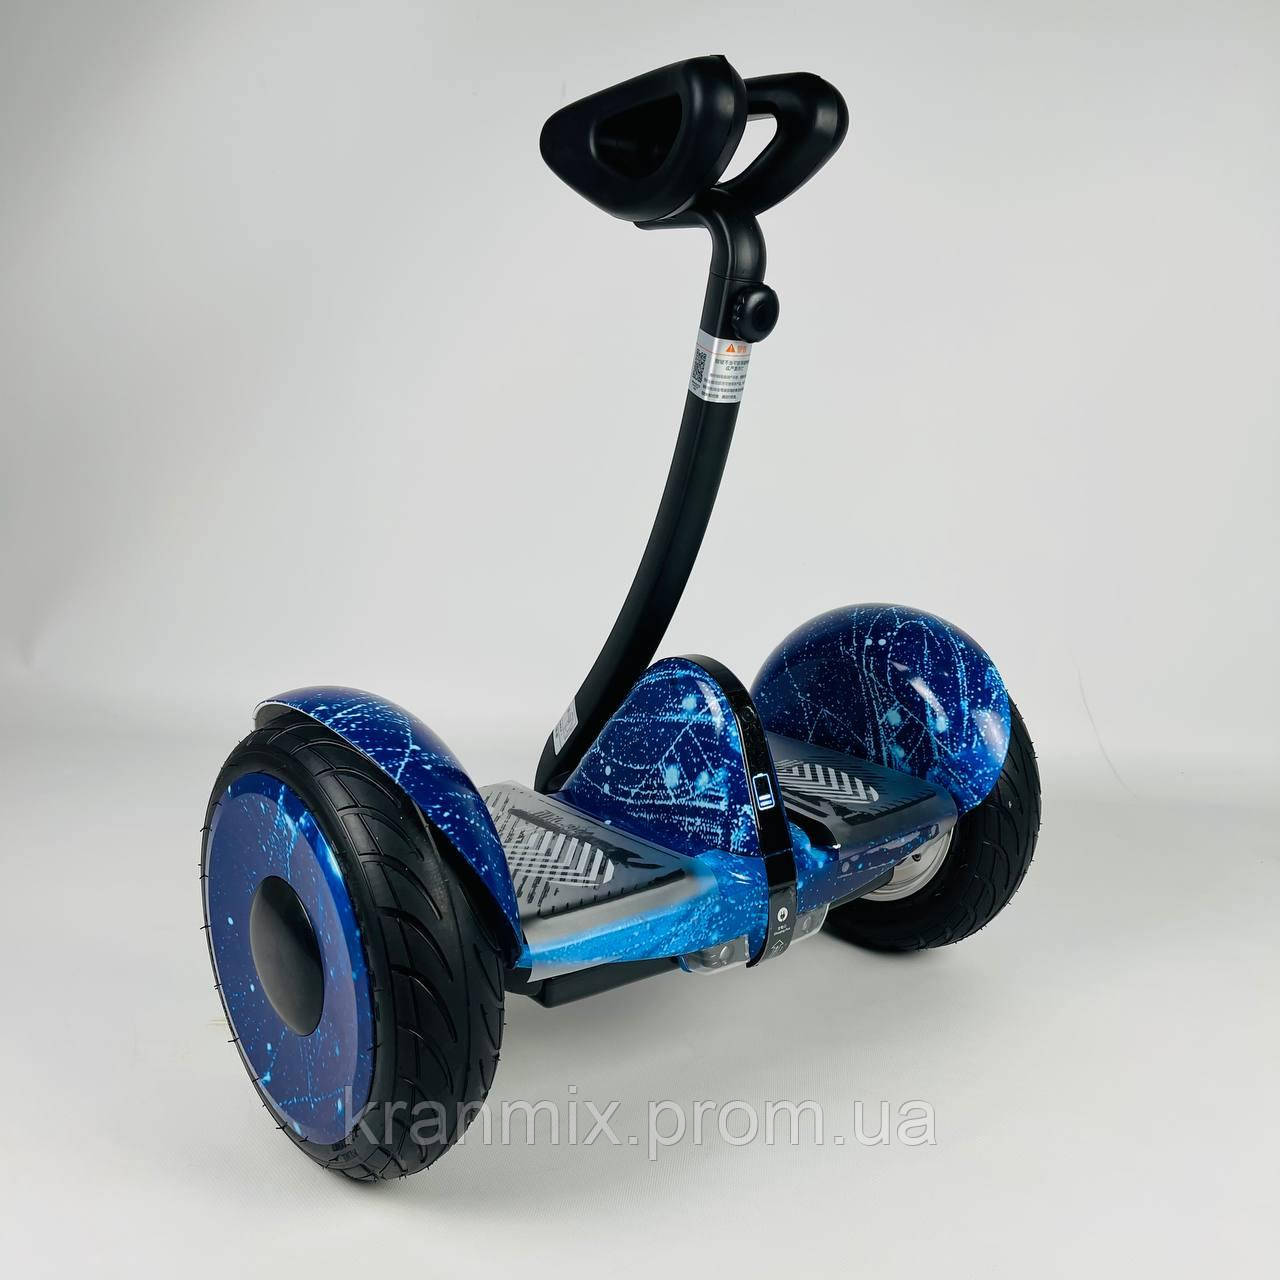 Ninebot Mini Синий Космос Гироборд Гироскутер Segway